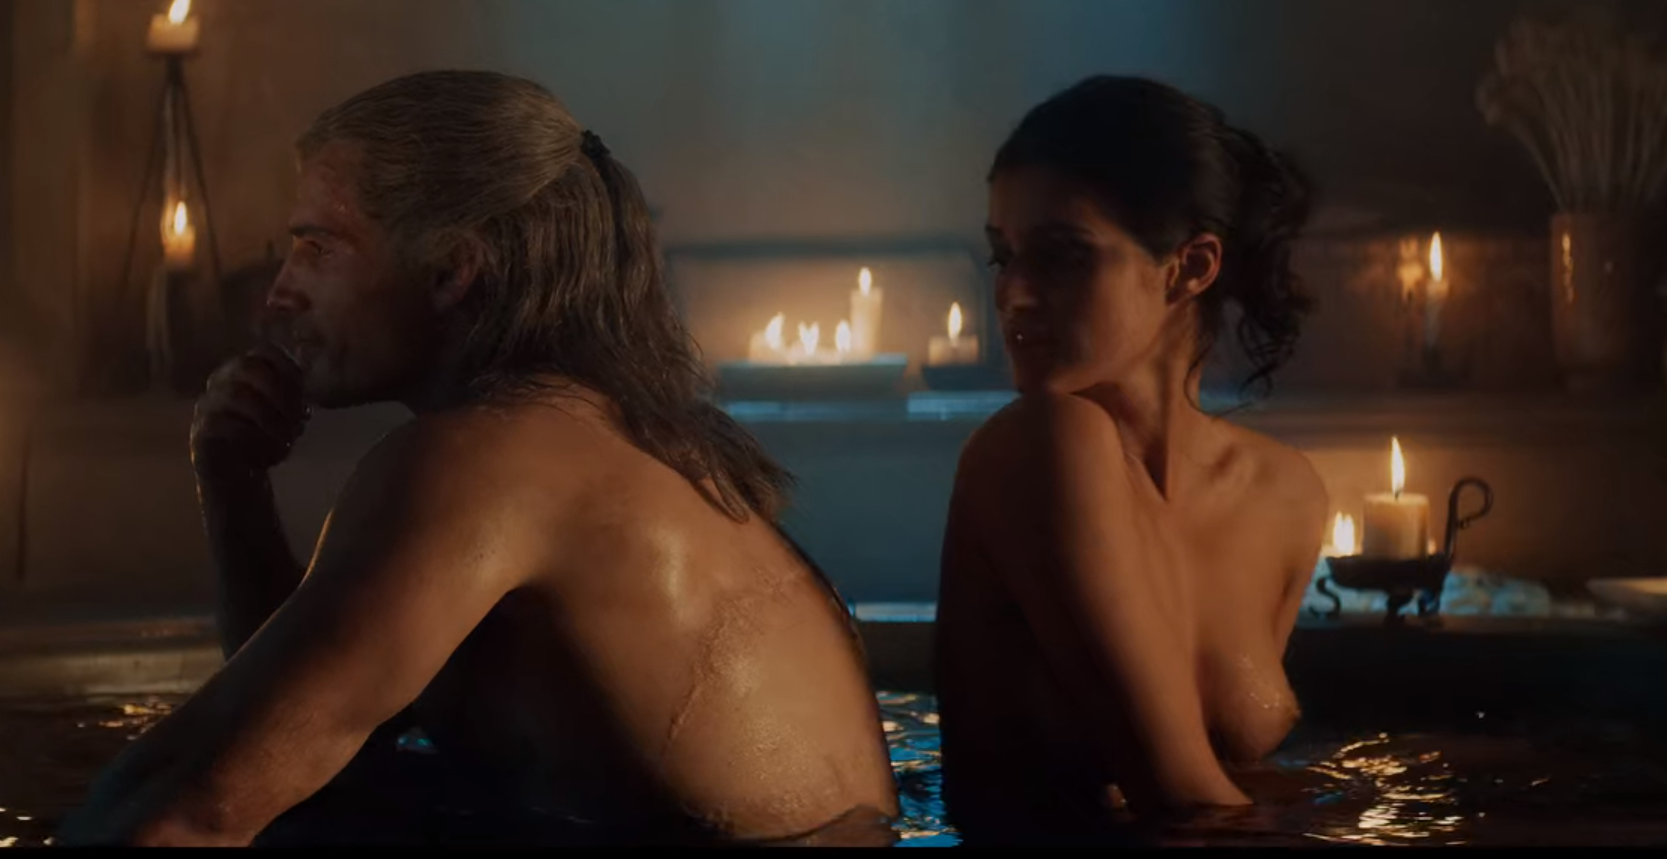 ✭ Geralt de Rivia/The Witcher, la serie de Netflix - Camino a la segunda temporada - Página 6 K1tumdBH_o